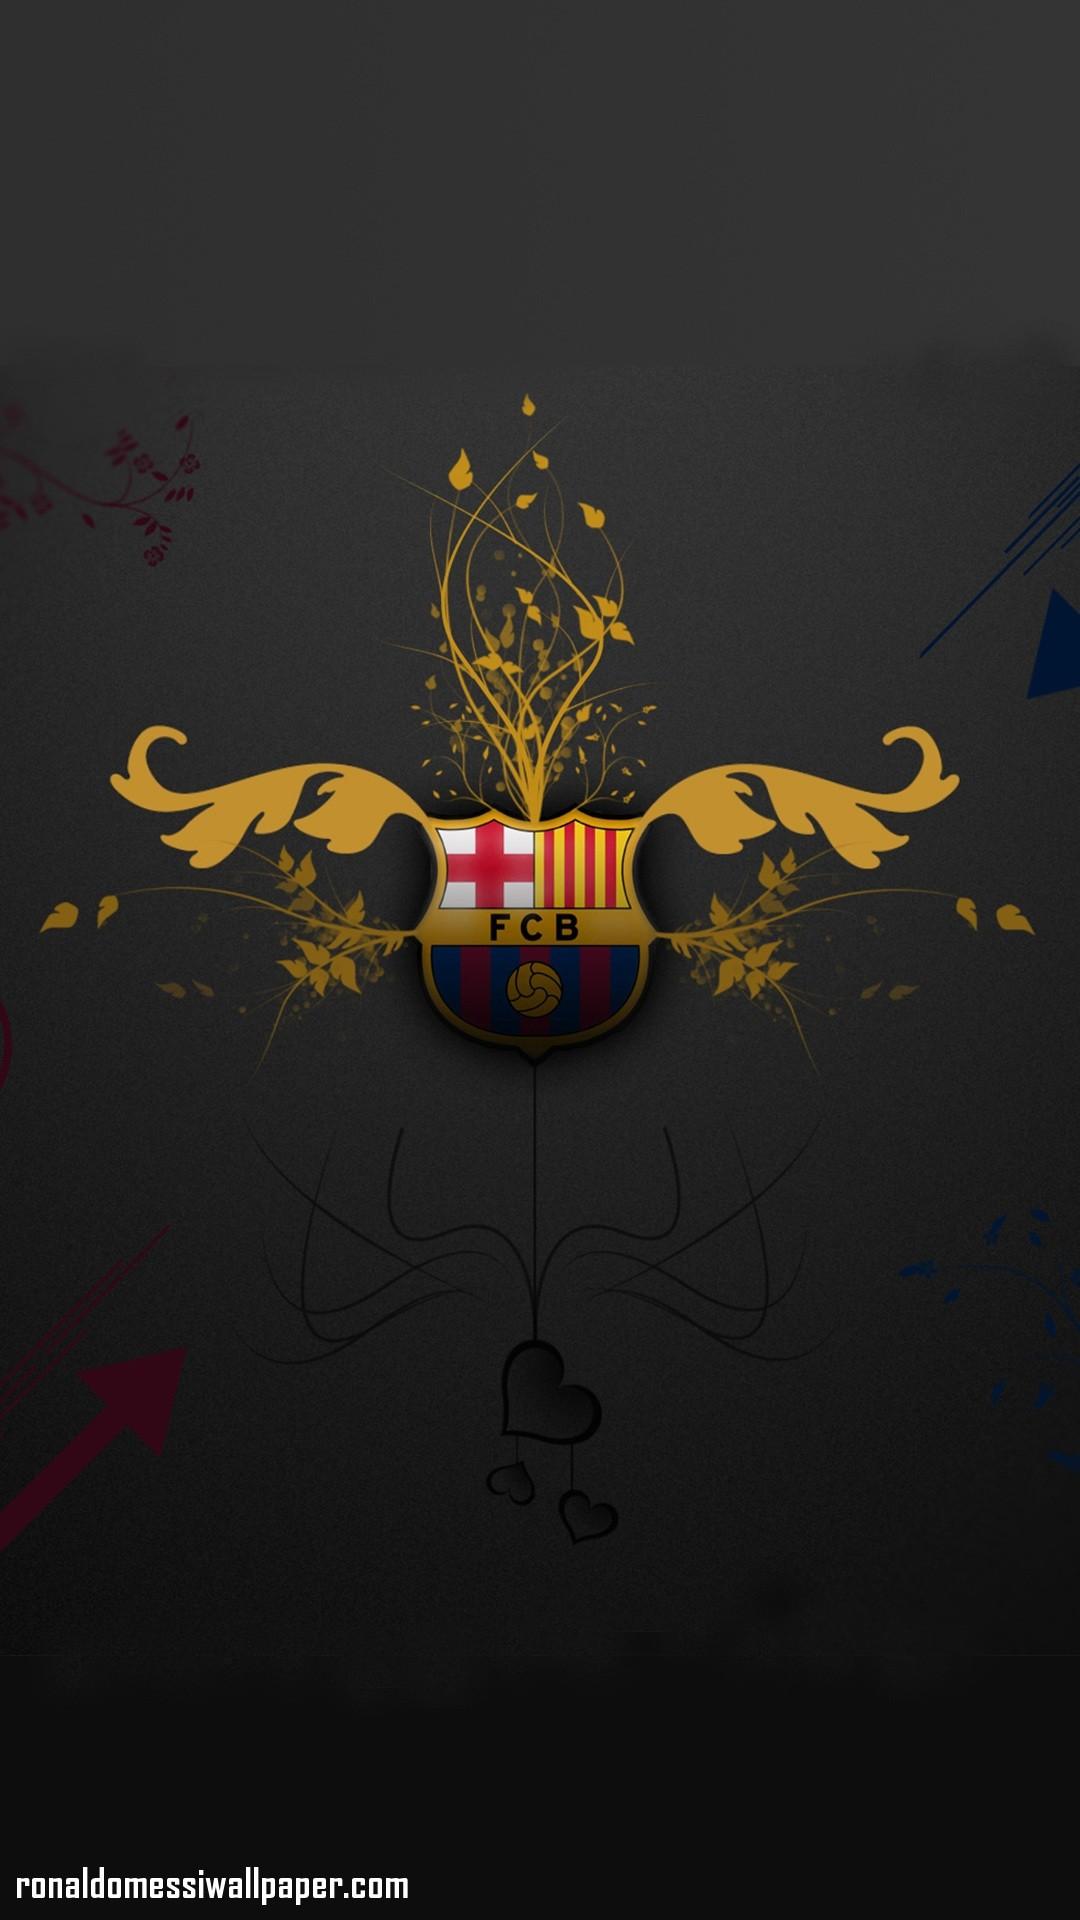 Manchester United Wallpaper Iphone X Barcelona Logo 2018 Wallpaper 70 Images